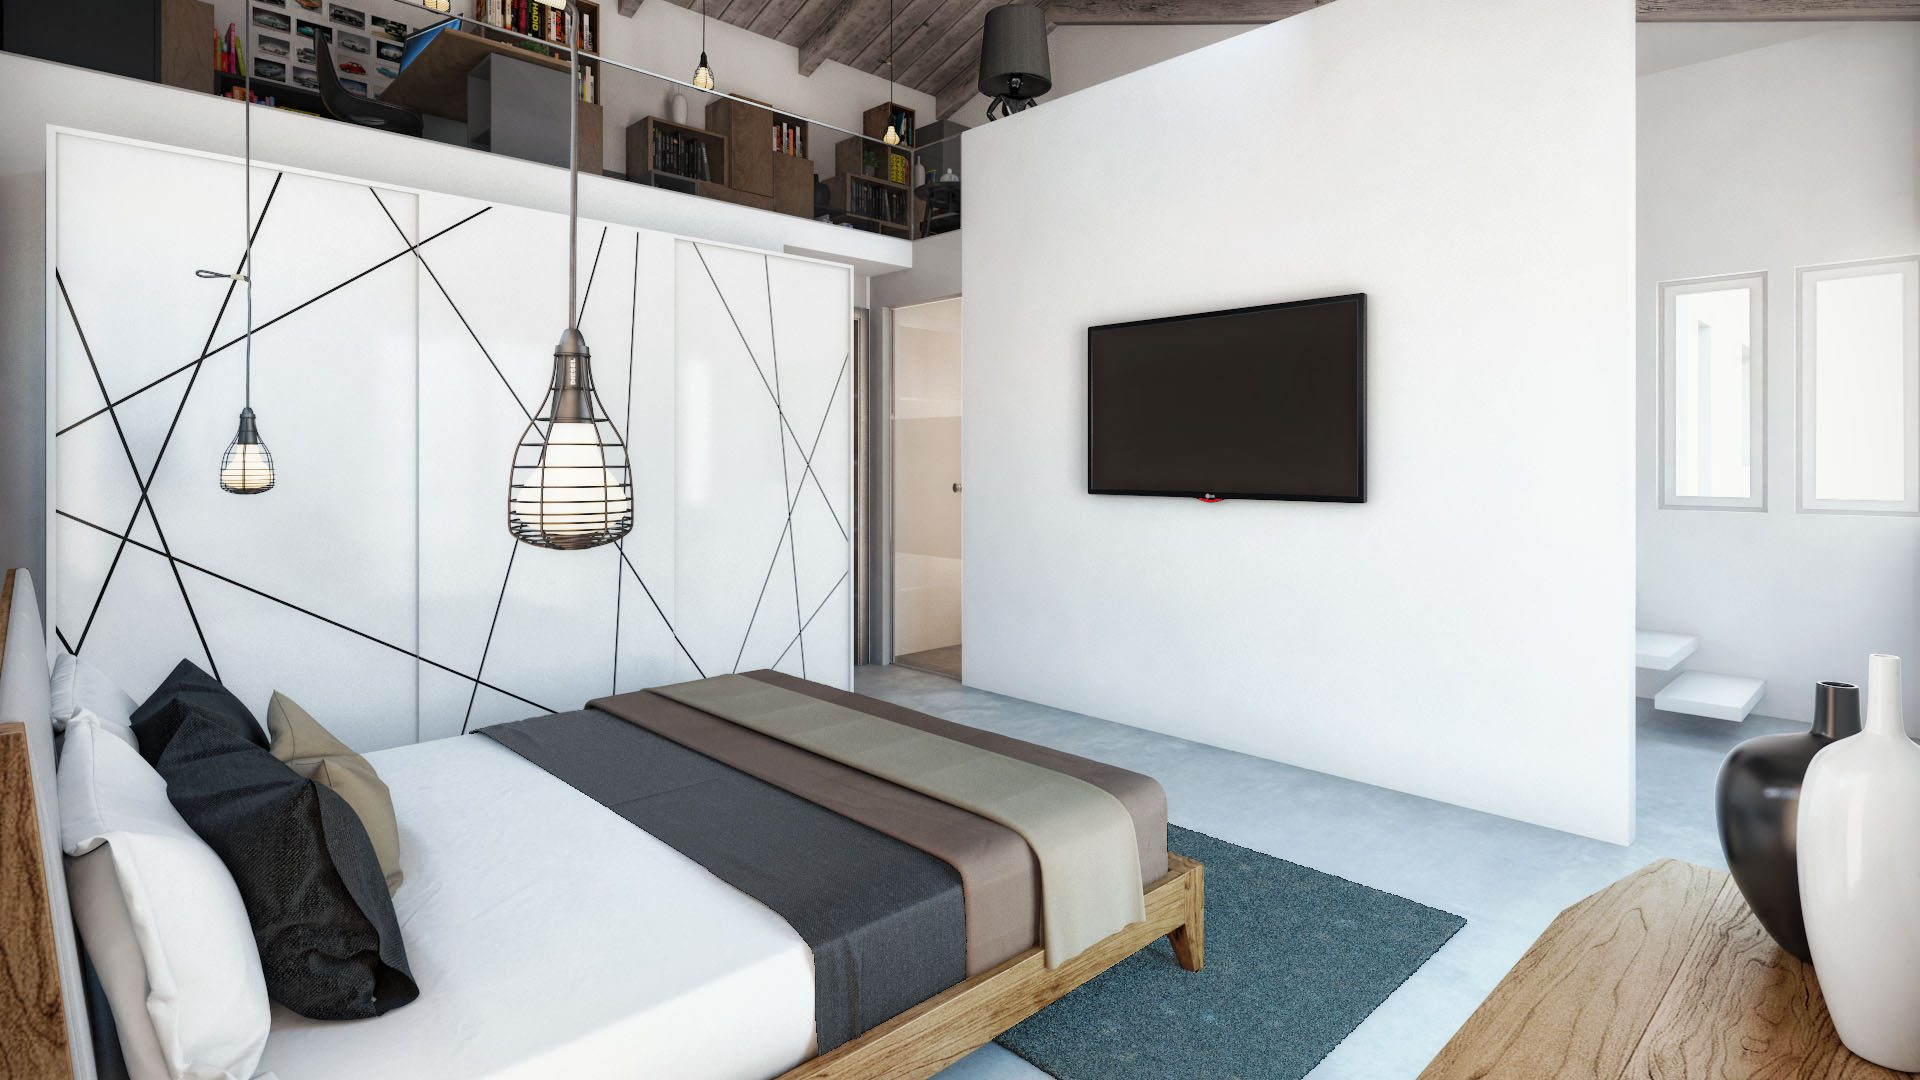 archicostudio_oreokastro_h1_bedroom